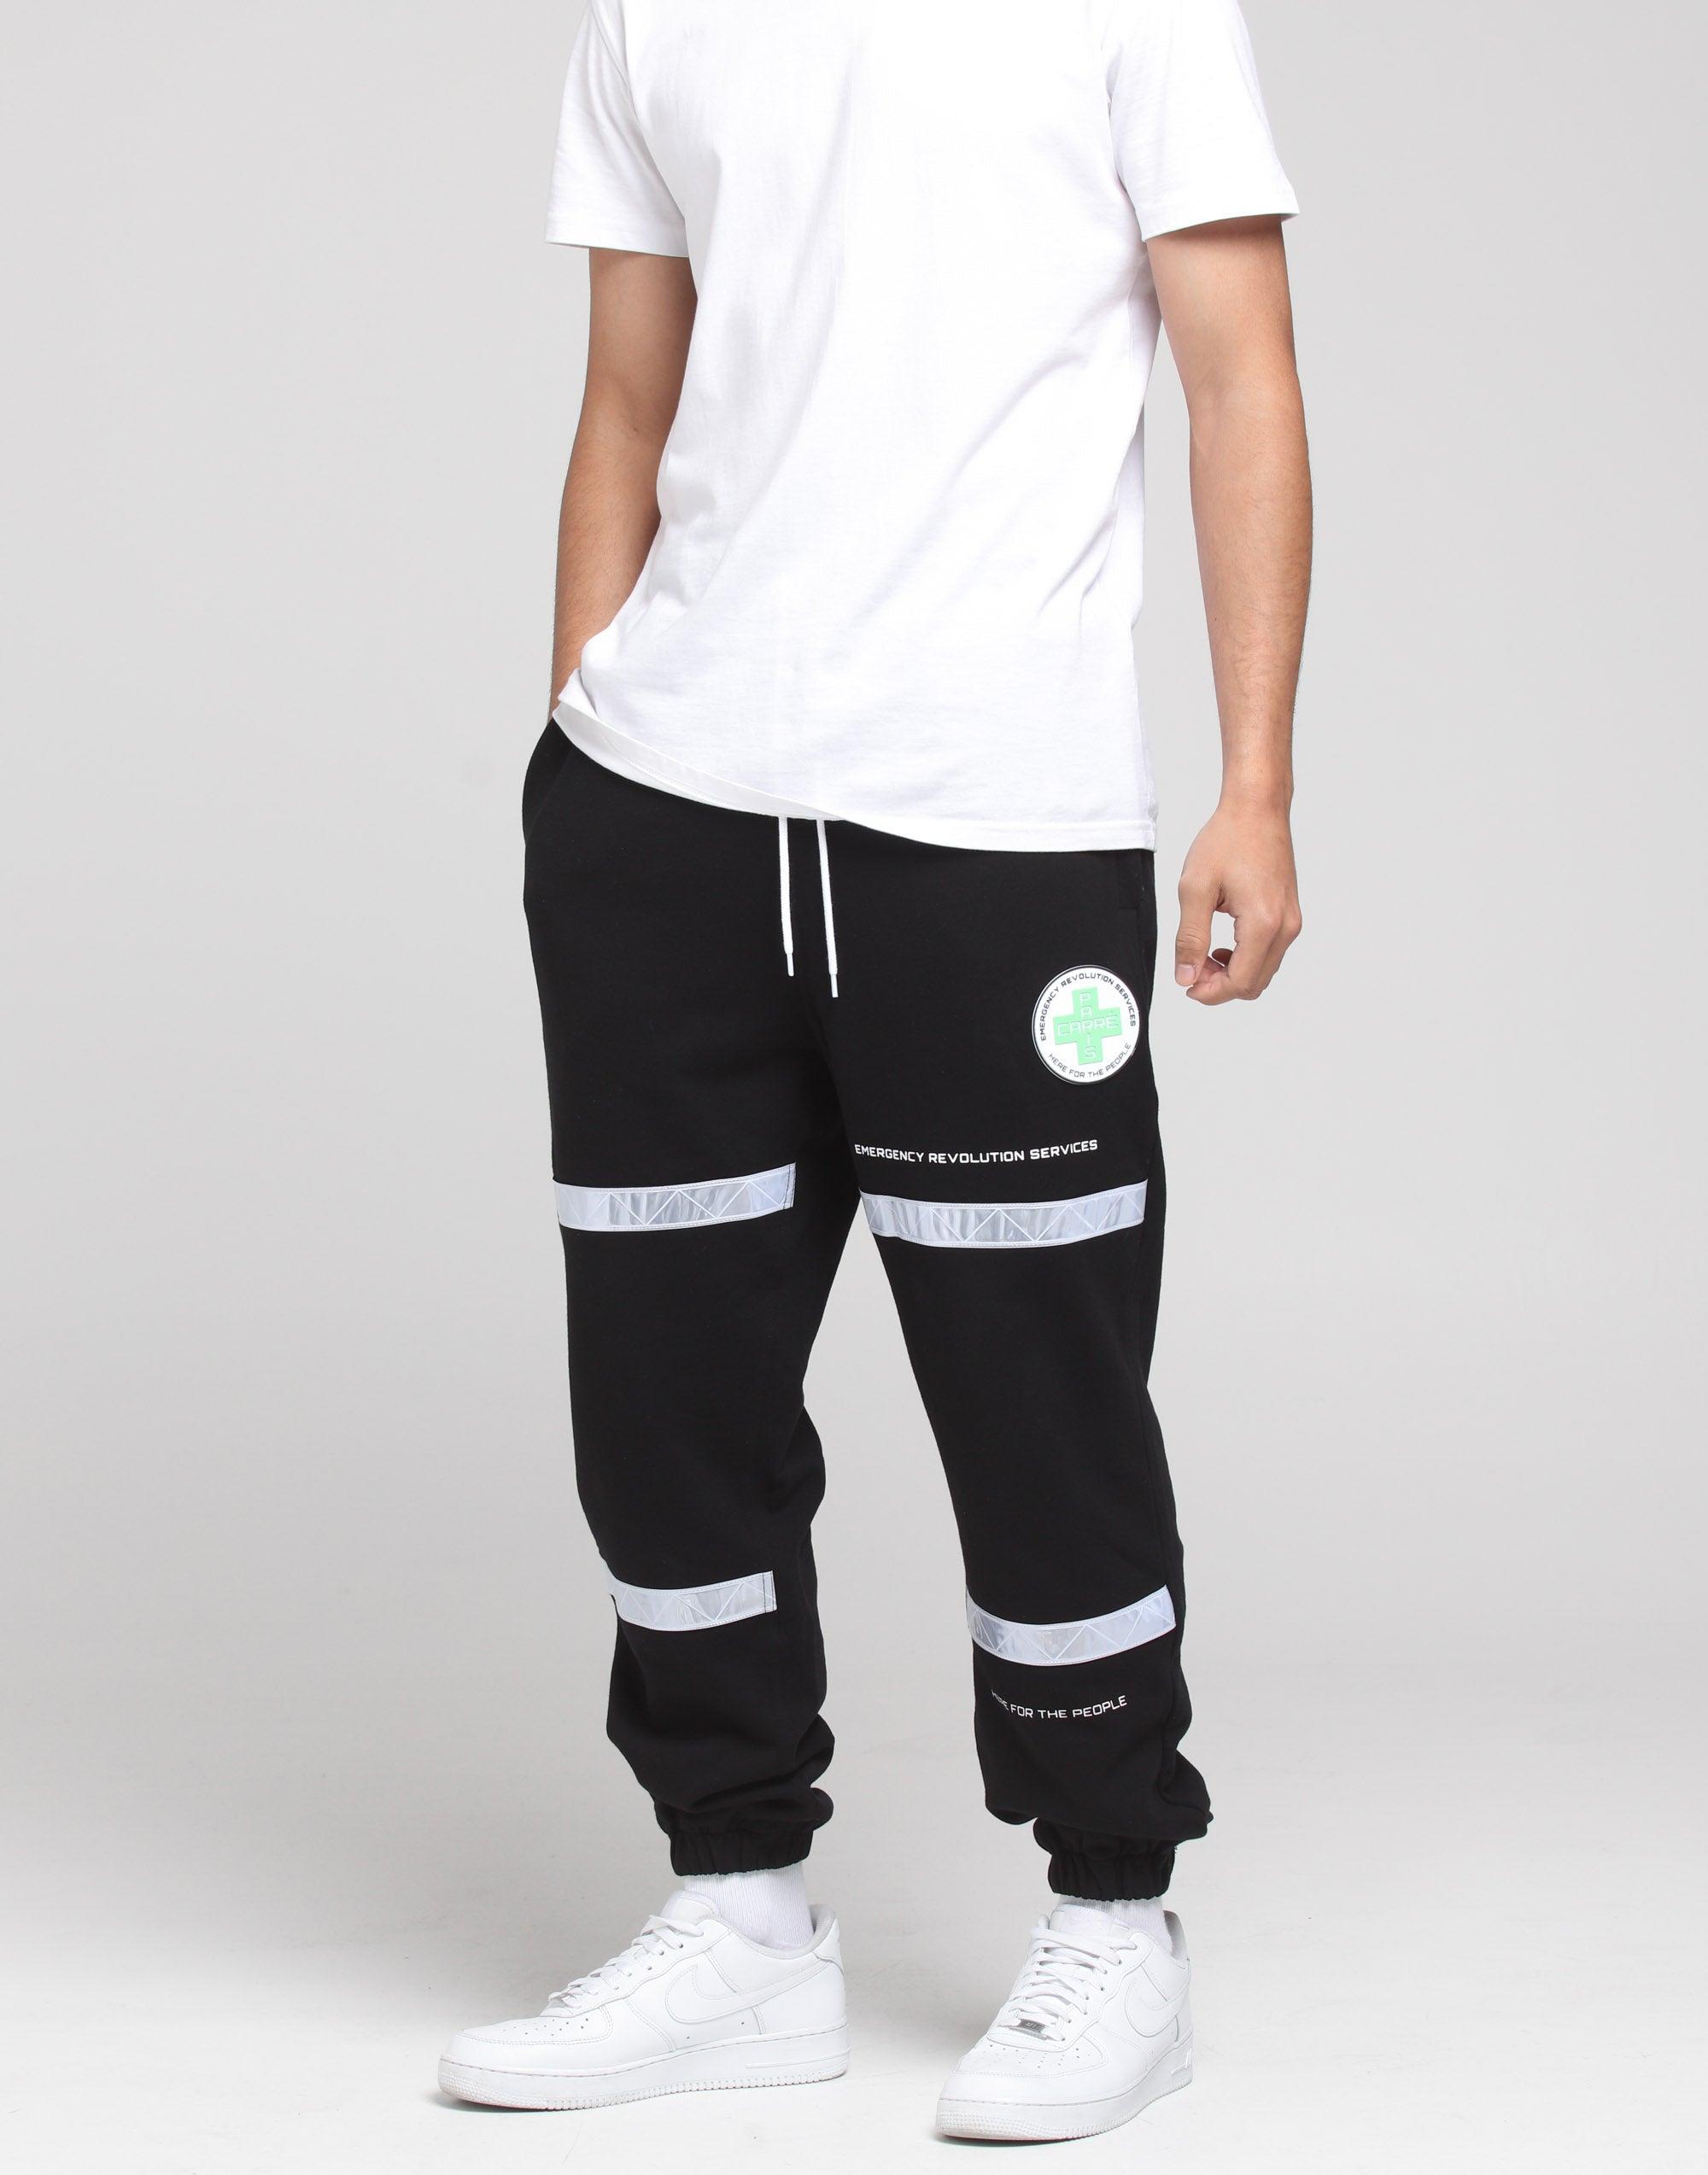 Kansas City CHIEFS Pants Sweats Gray Sweatpants M L XL NWT